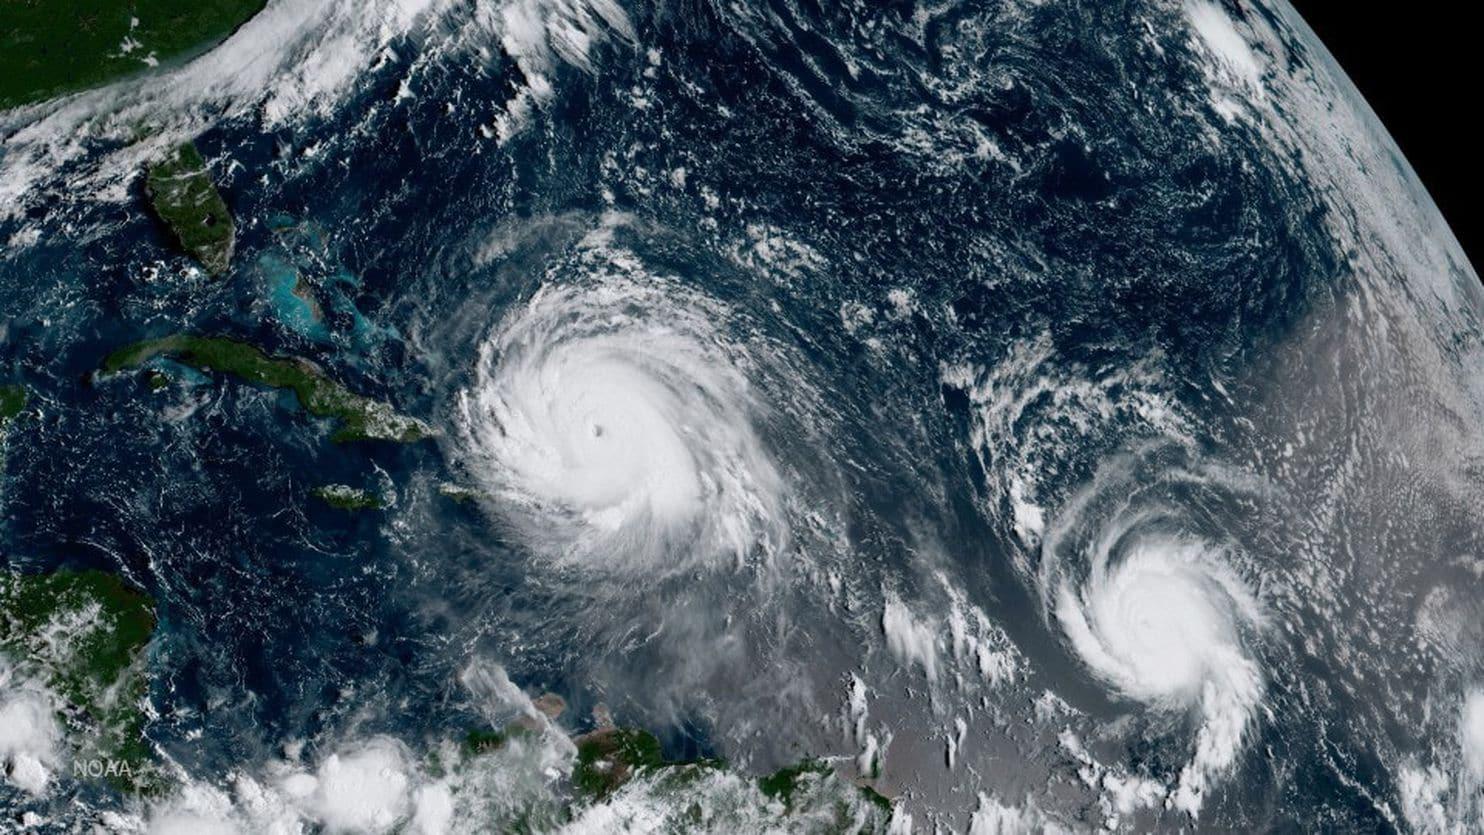 City of Miami Secures $7.3 Million Reimbursement Check from FEMA for Irma